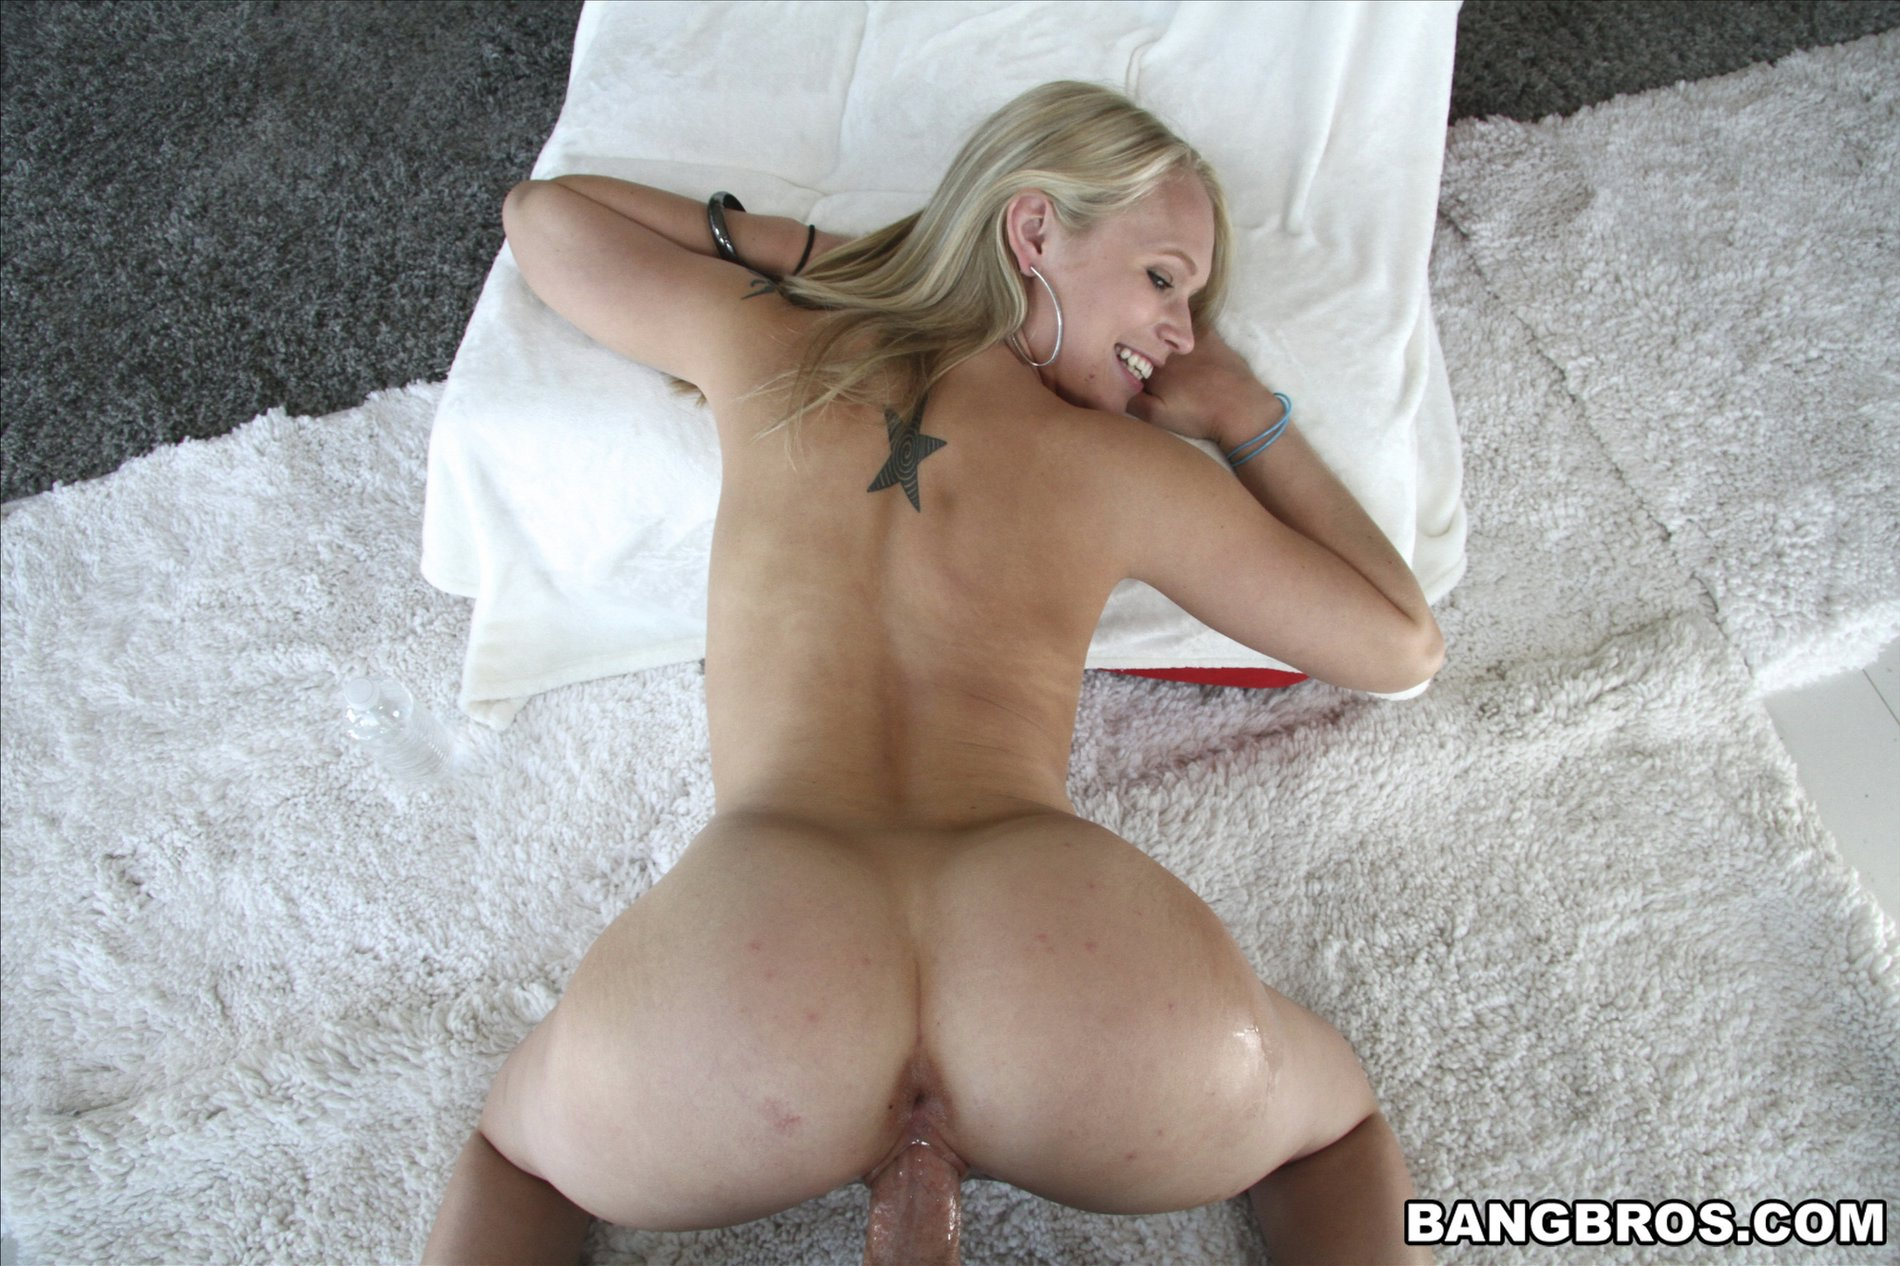 Bed fun for dakota skye and chloe amour on lesbian porn